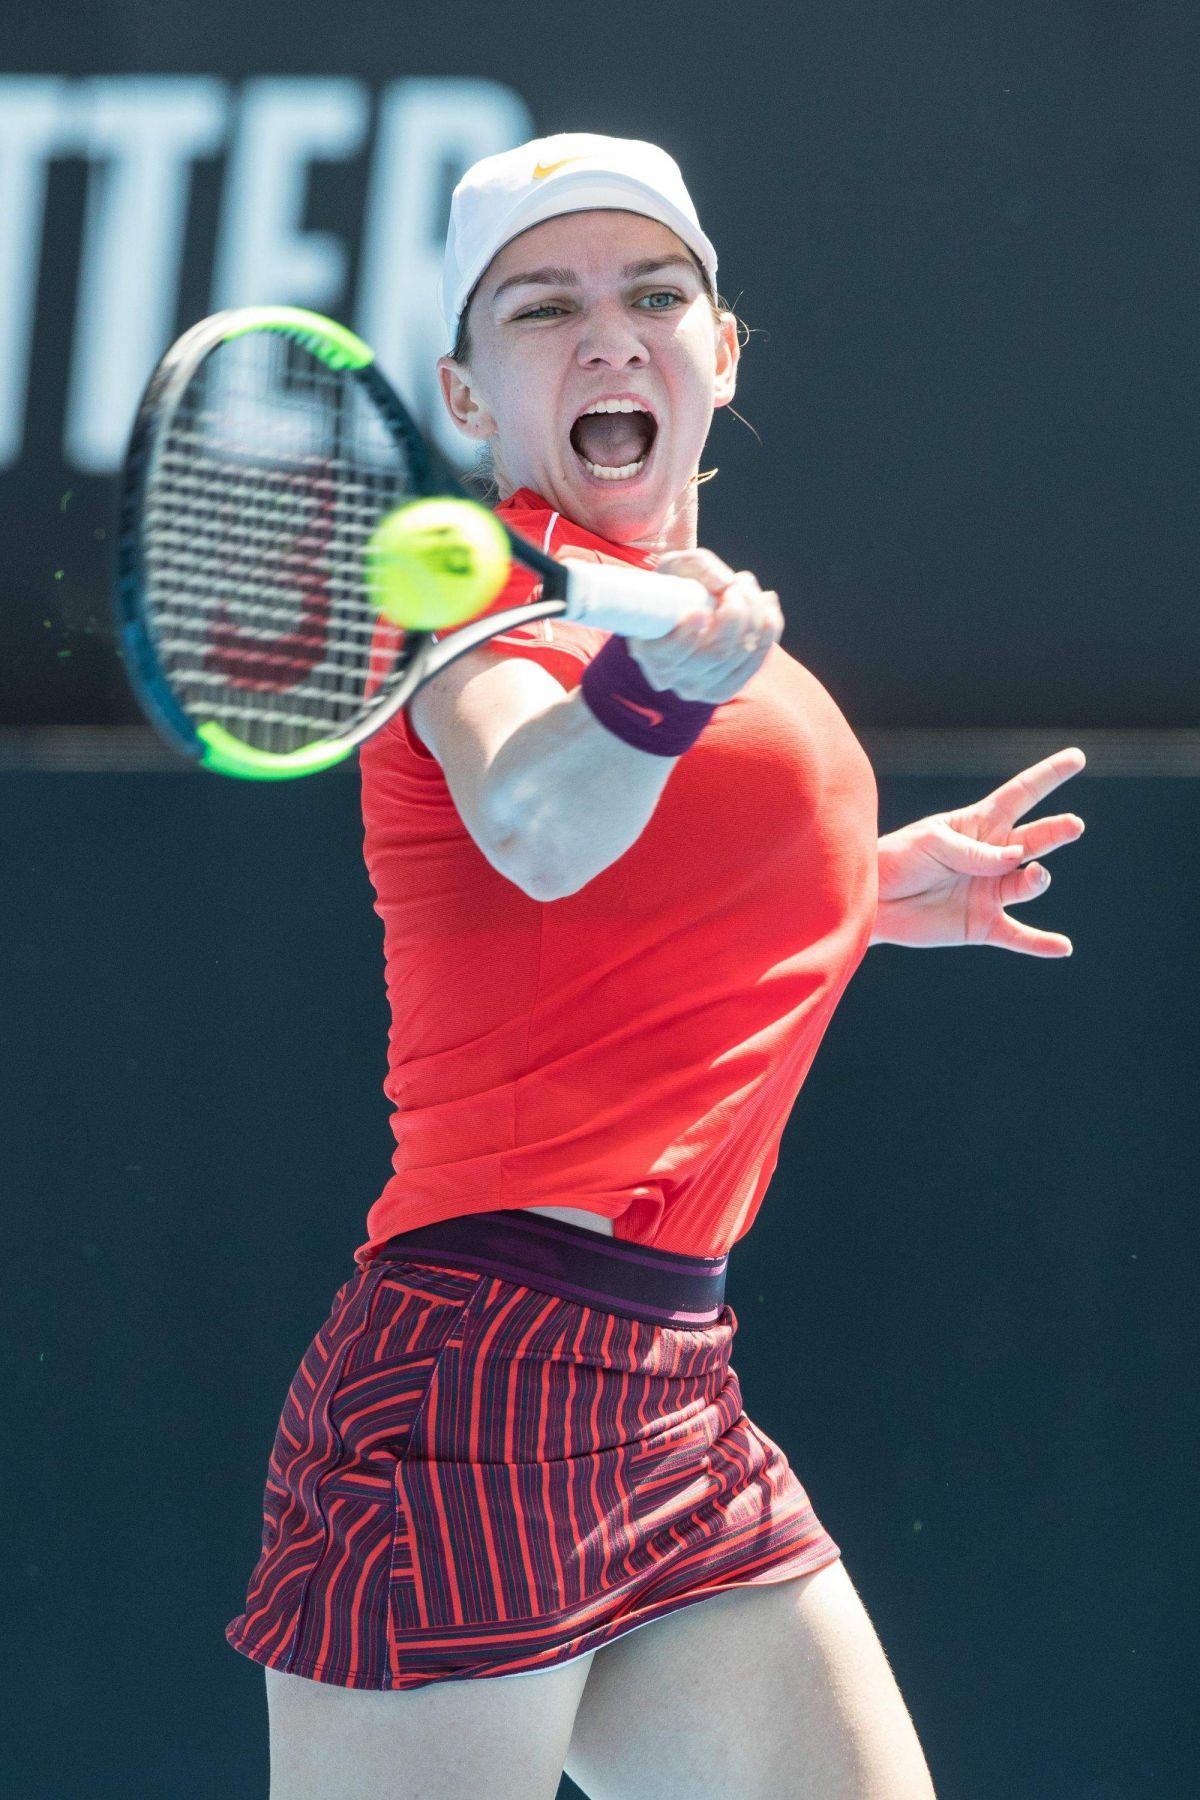 Simona Halep - Sunday, March 10, 2019 - BNP Paribas Open